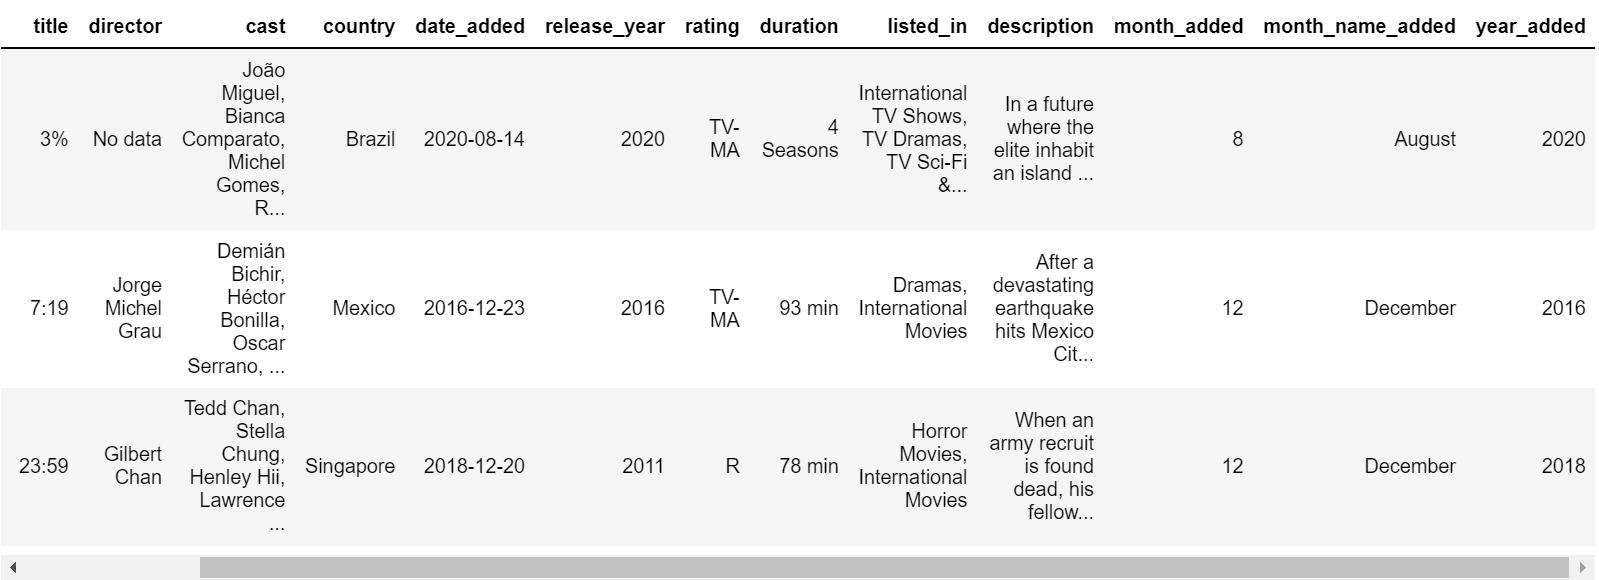 data preprocesing | Visualizing Netflix Data python